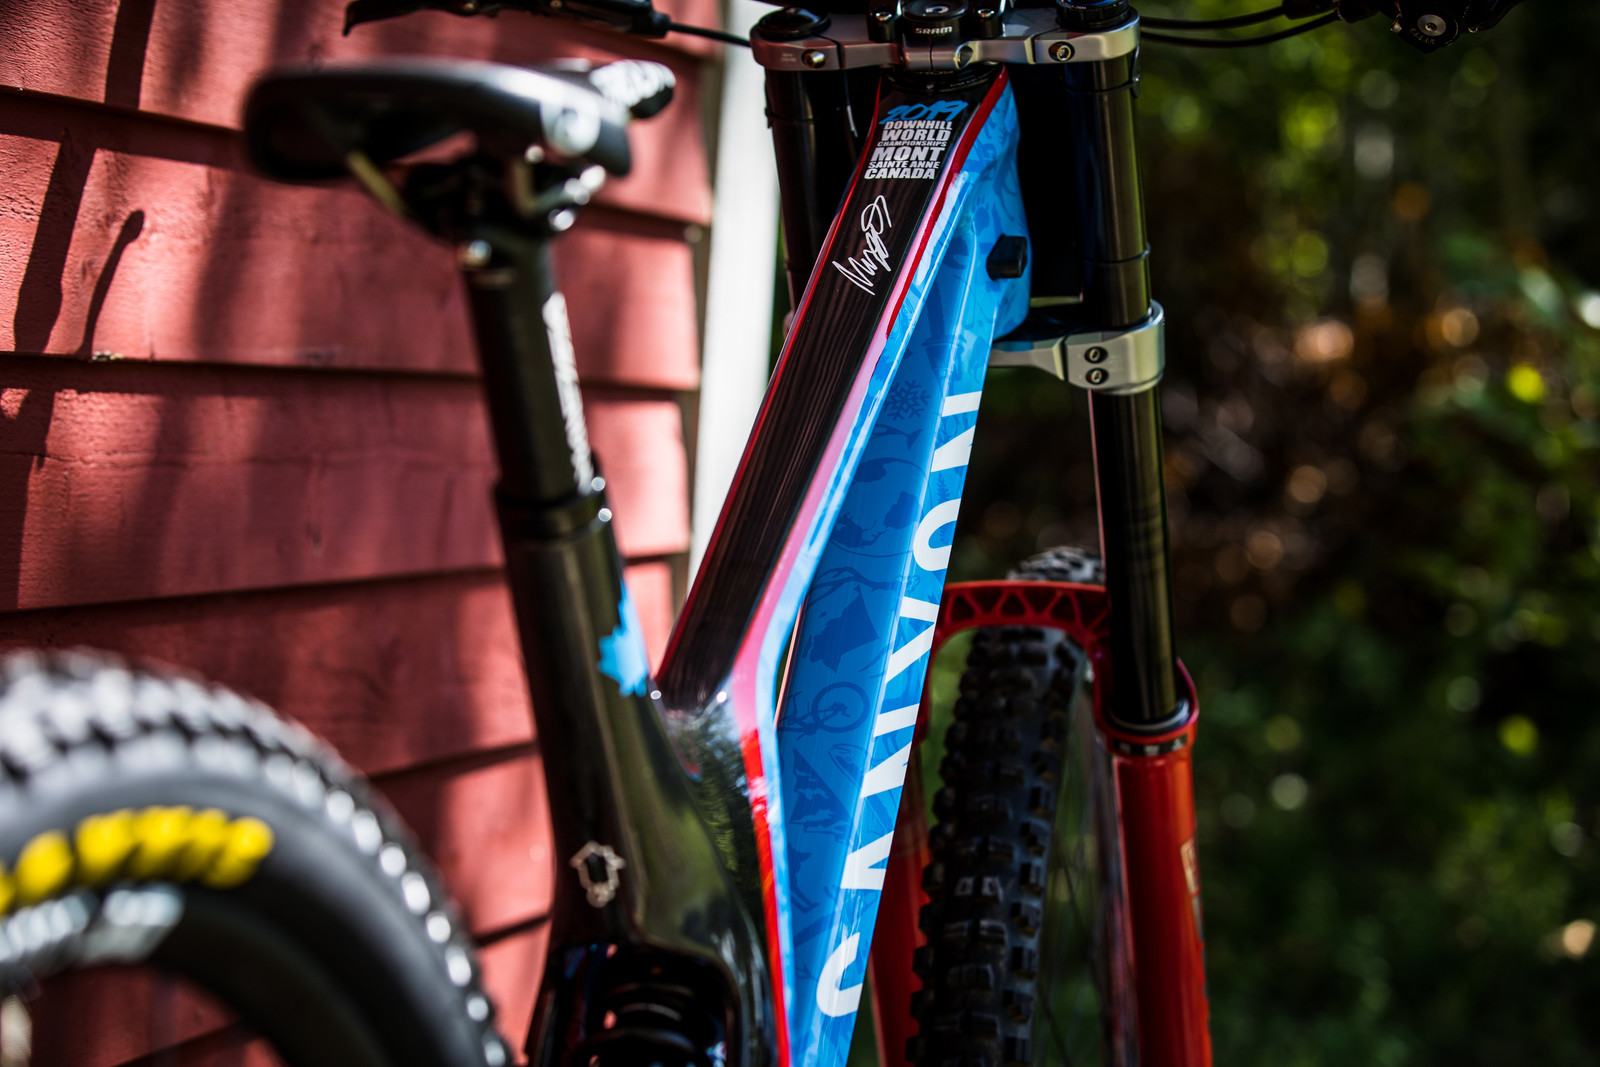 Magnus Manson's World Champs Canyon Sender - Magnus Manson's World Champs Canyon Sender - Mountain Biking Pictures - Vital MTB